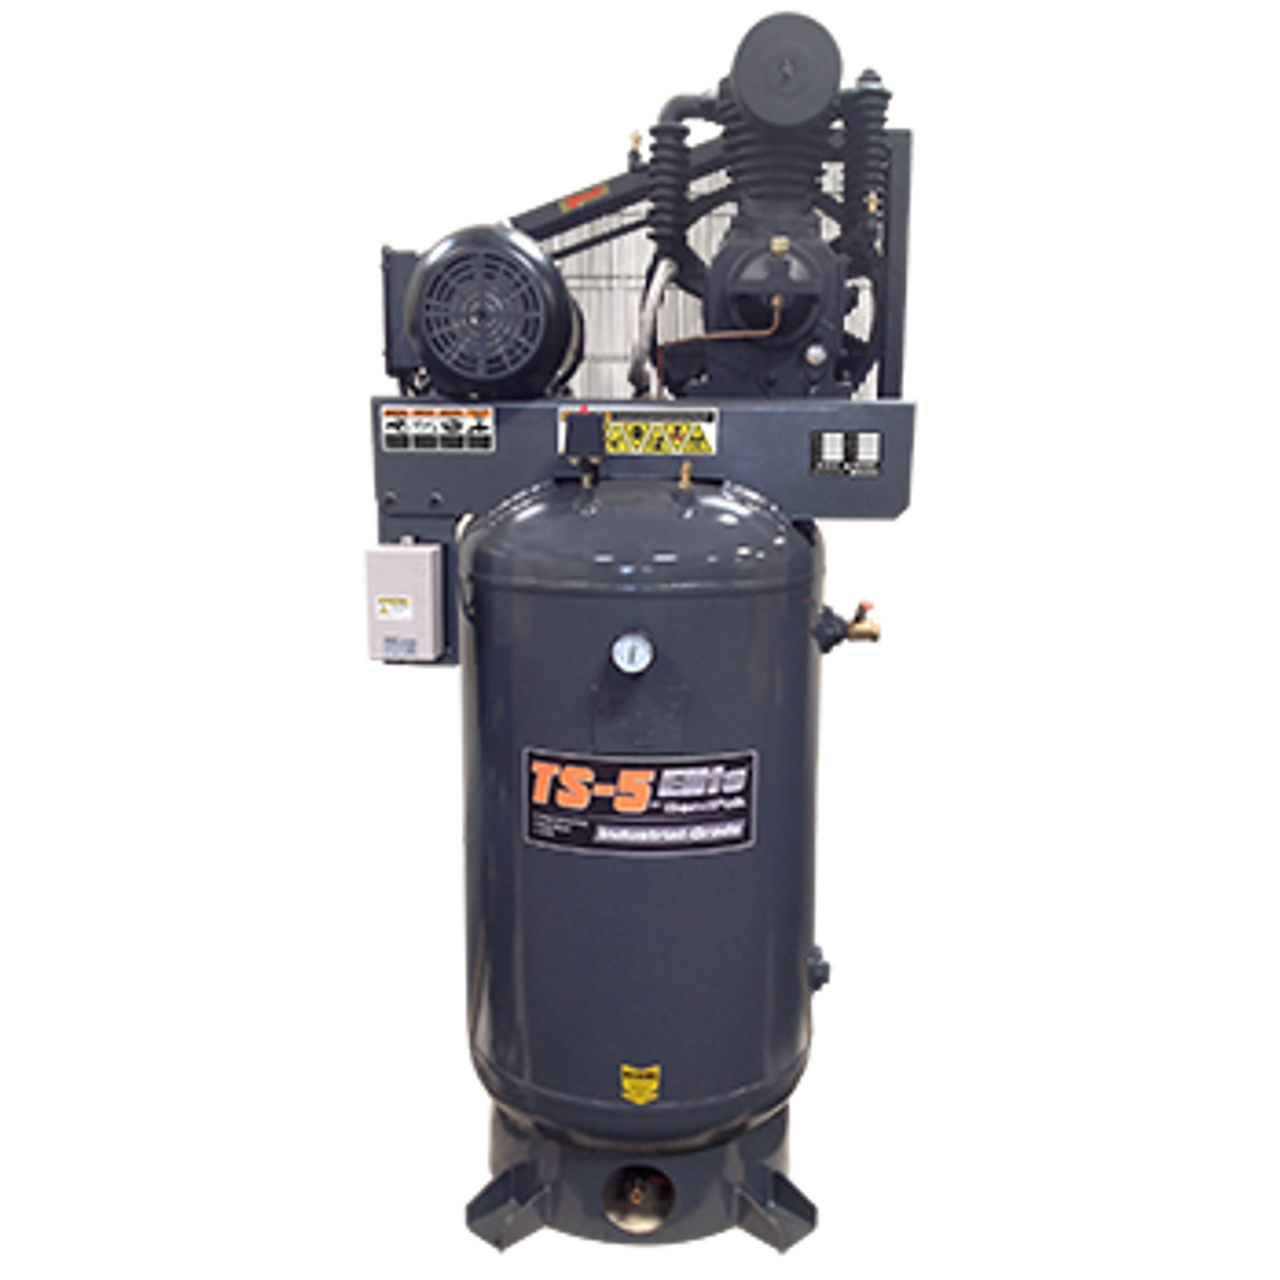 BendPak TS-580V-601 Elite™ Air Compressor, 5 HP, 80‐Gallon Vertical Tank (5179105)